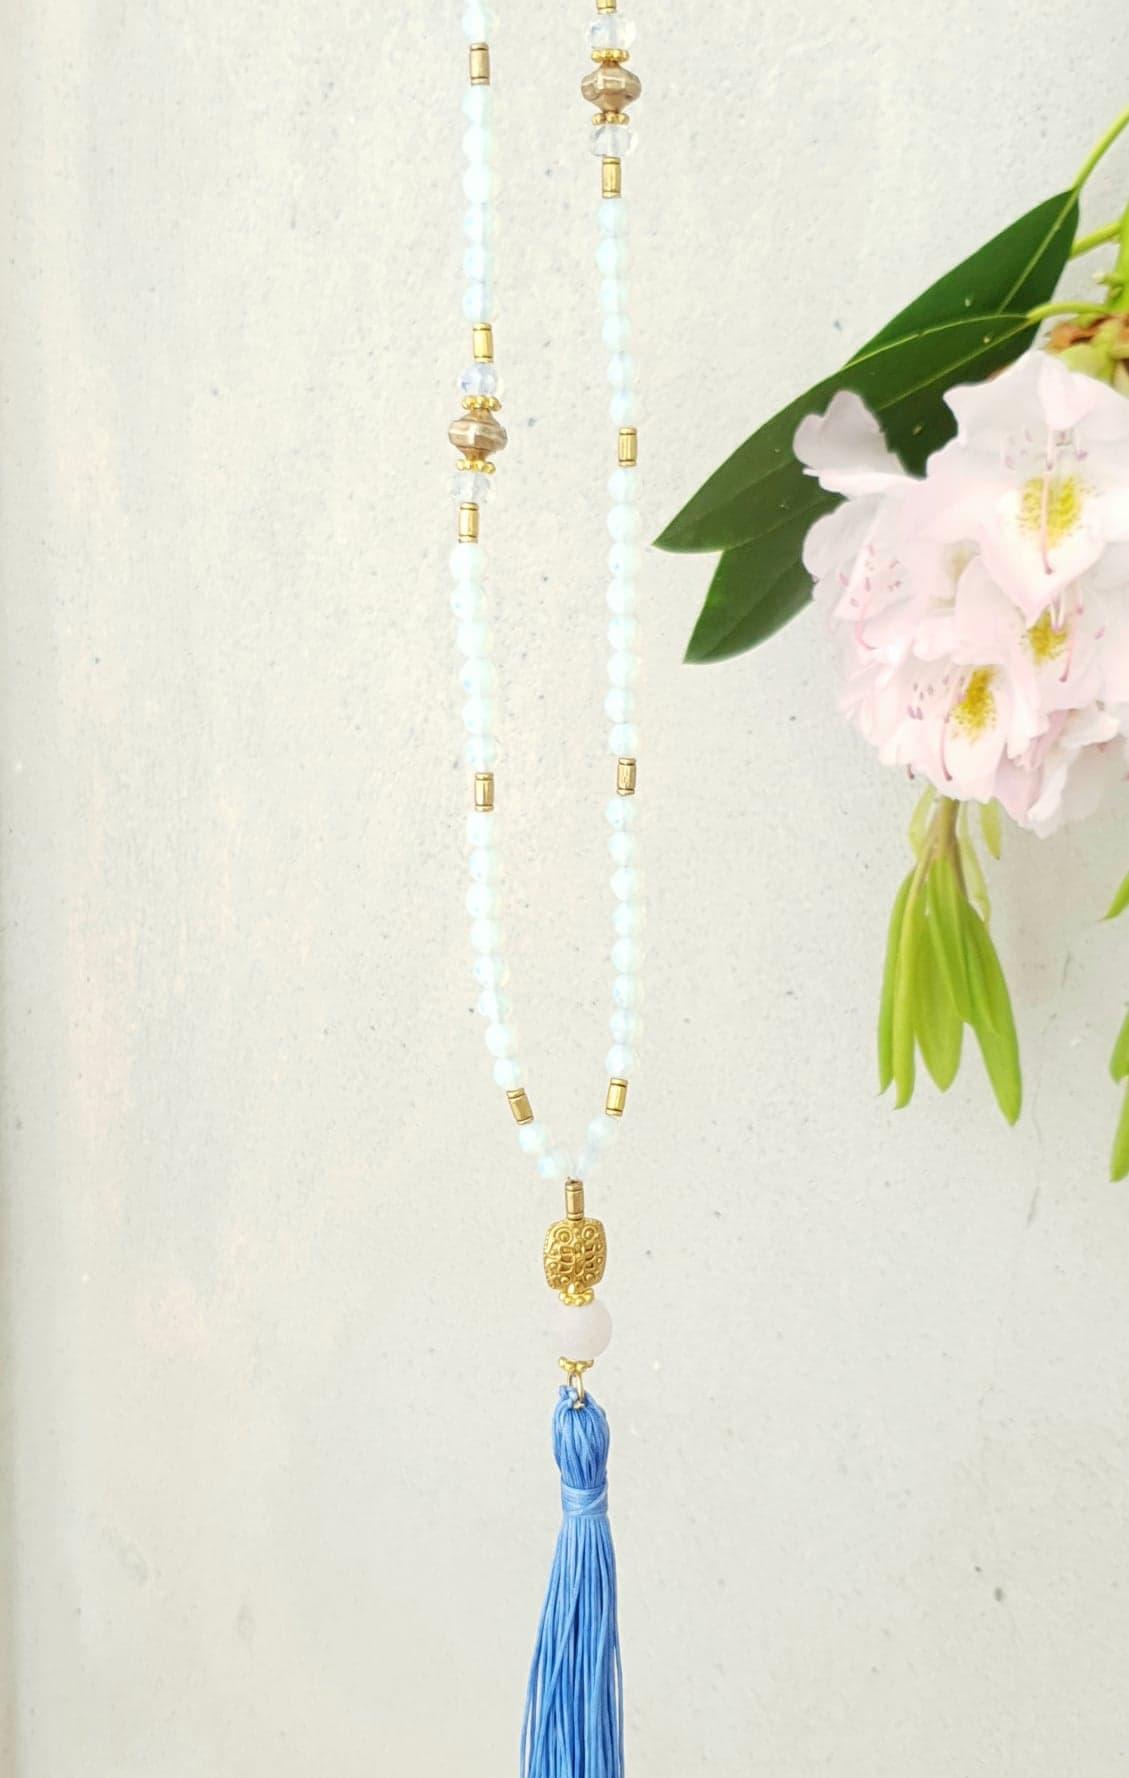 Kæde i syntetisk opal med kvast